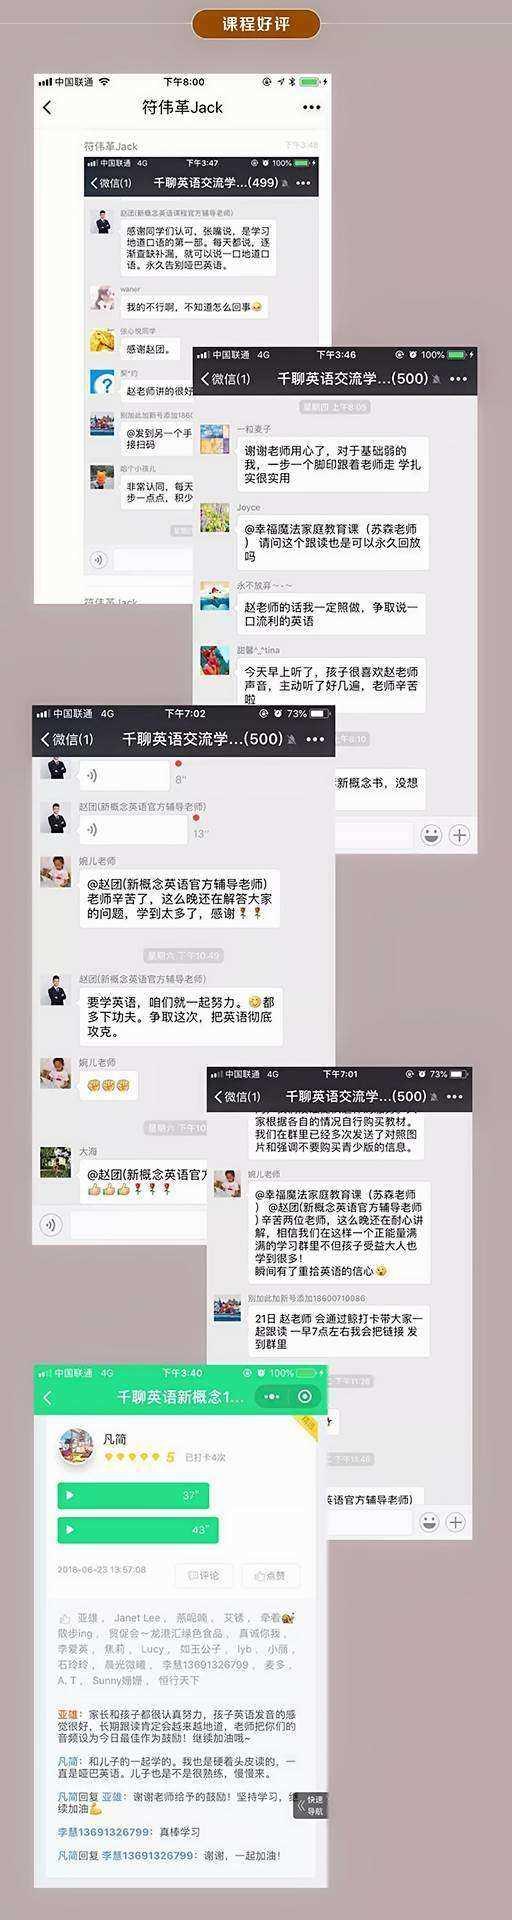 http://www.huodongxing.com/file/20160530/5092341960349/723248896746357.jpg